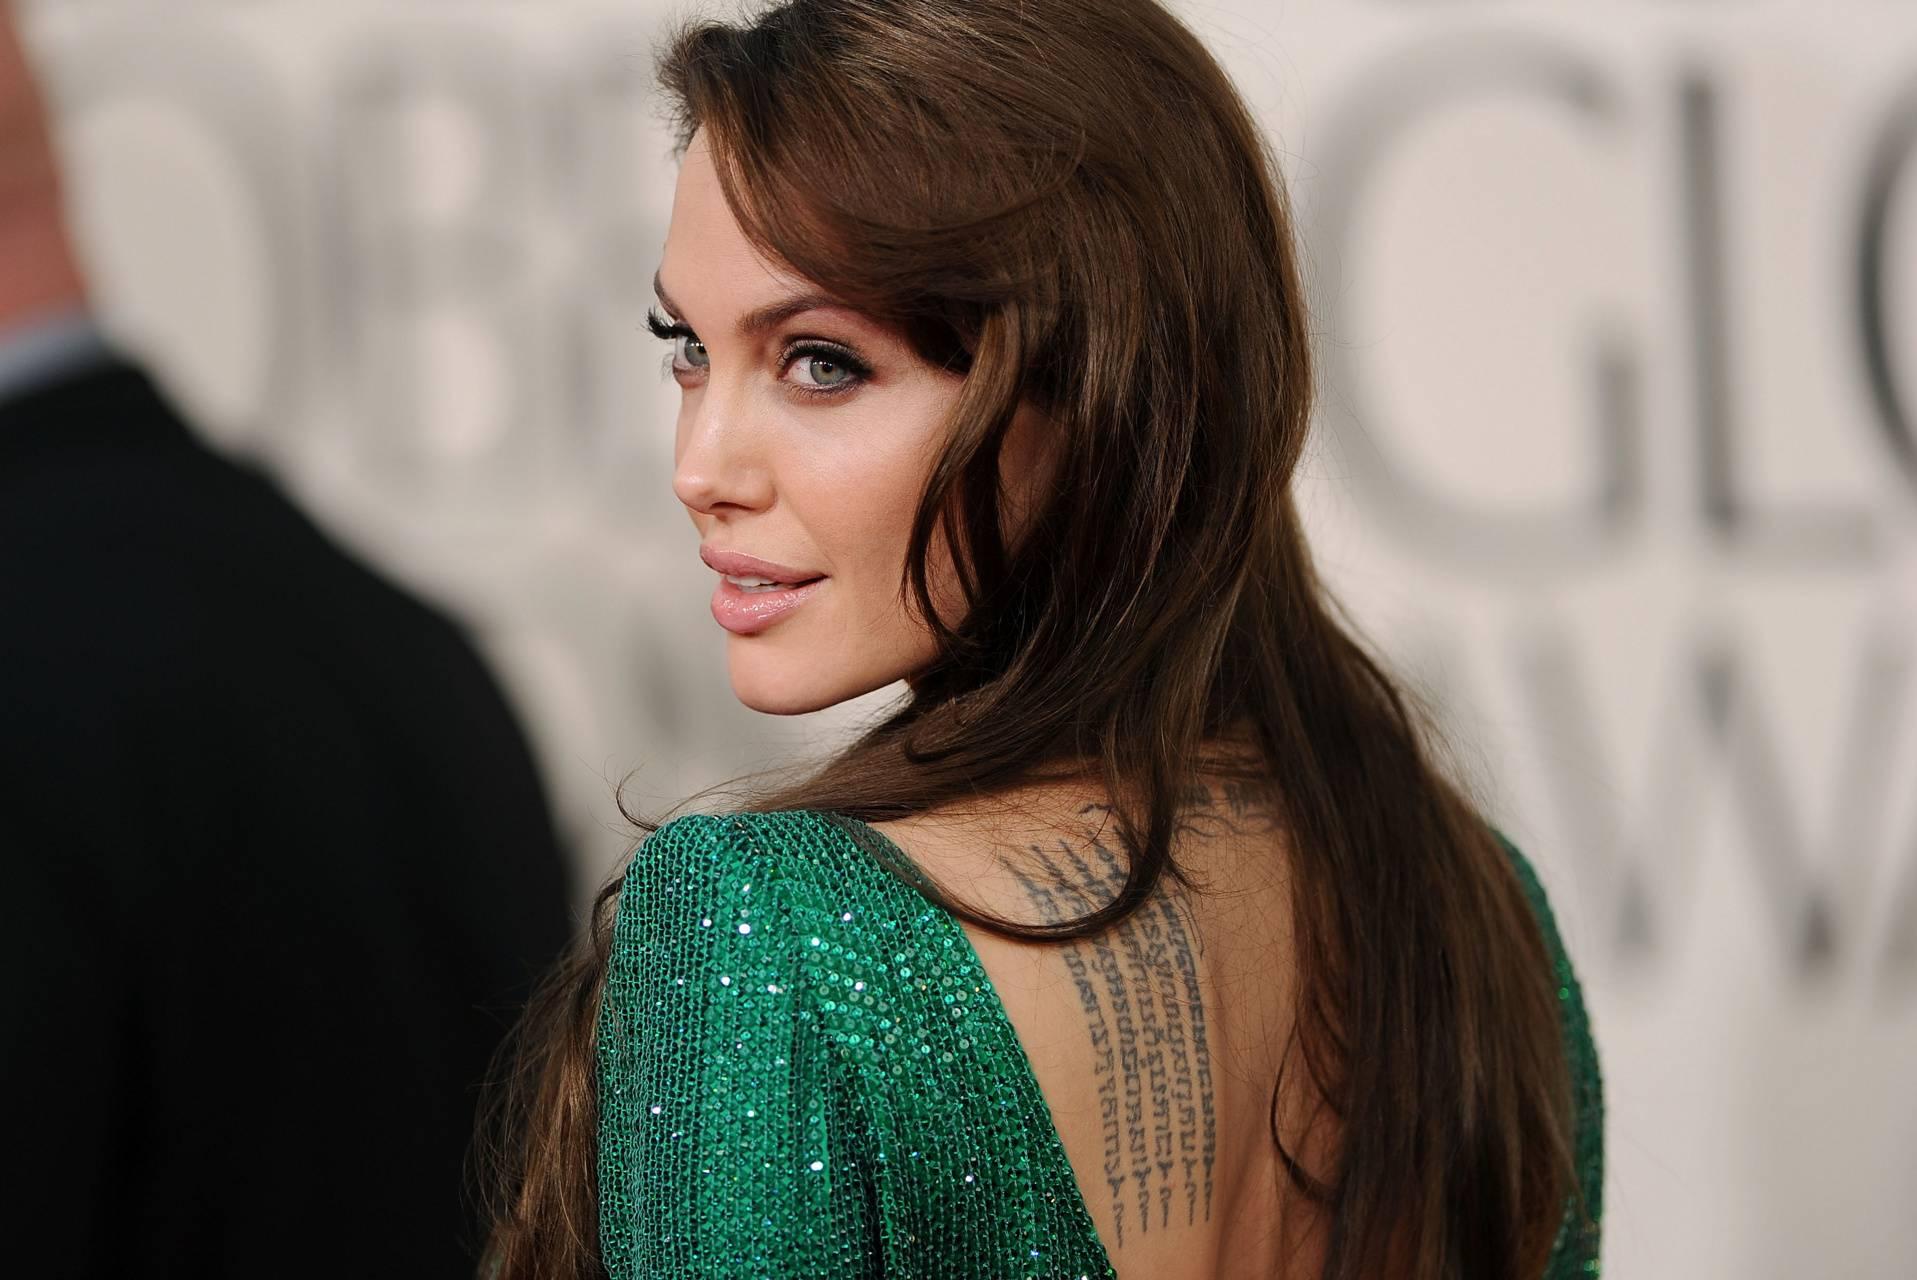 Angelina Jolie Hot And Sexy Pics angelina jolie wallpapermanorocks - 93 - free on zedge™